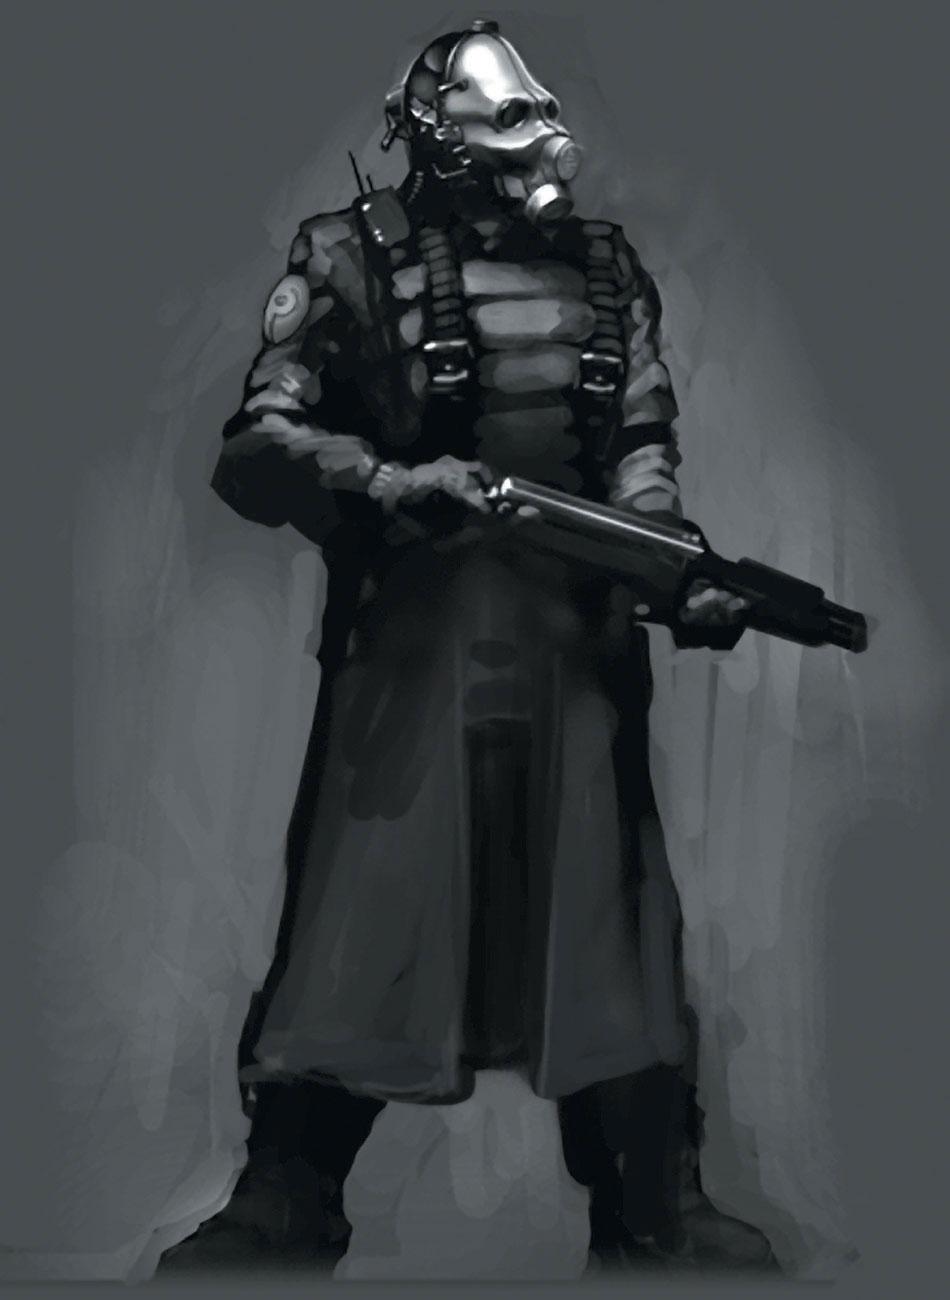 Combine guard (Civil Protection)